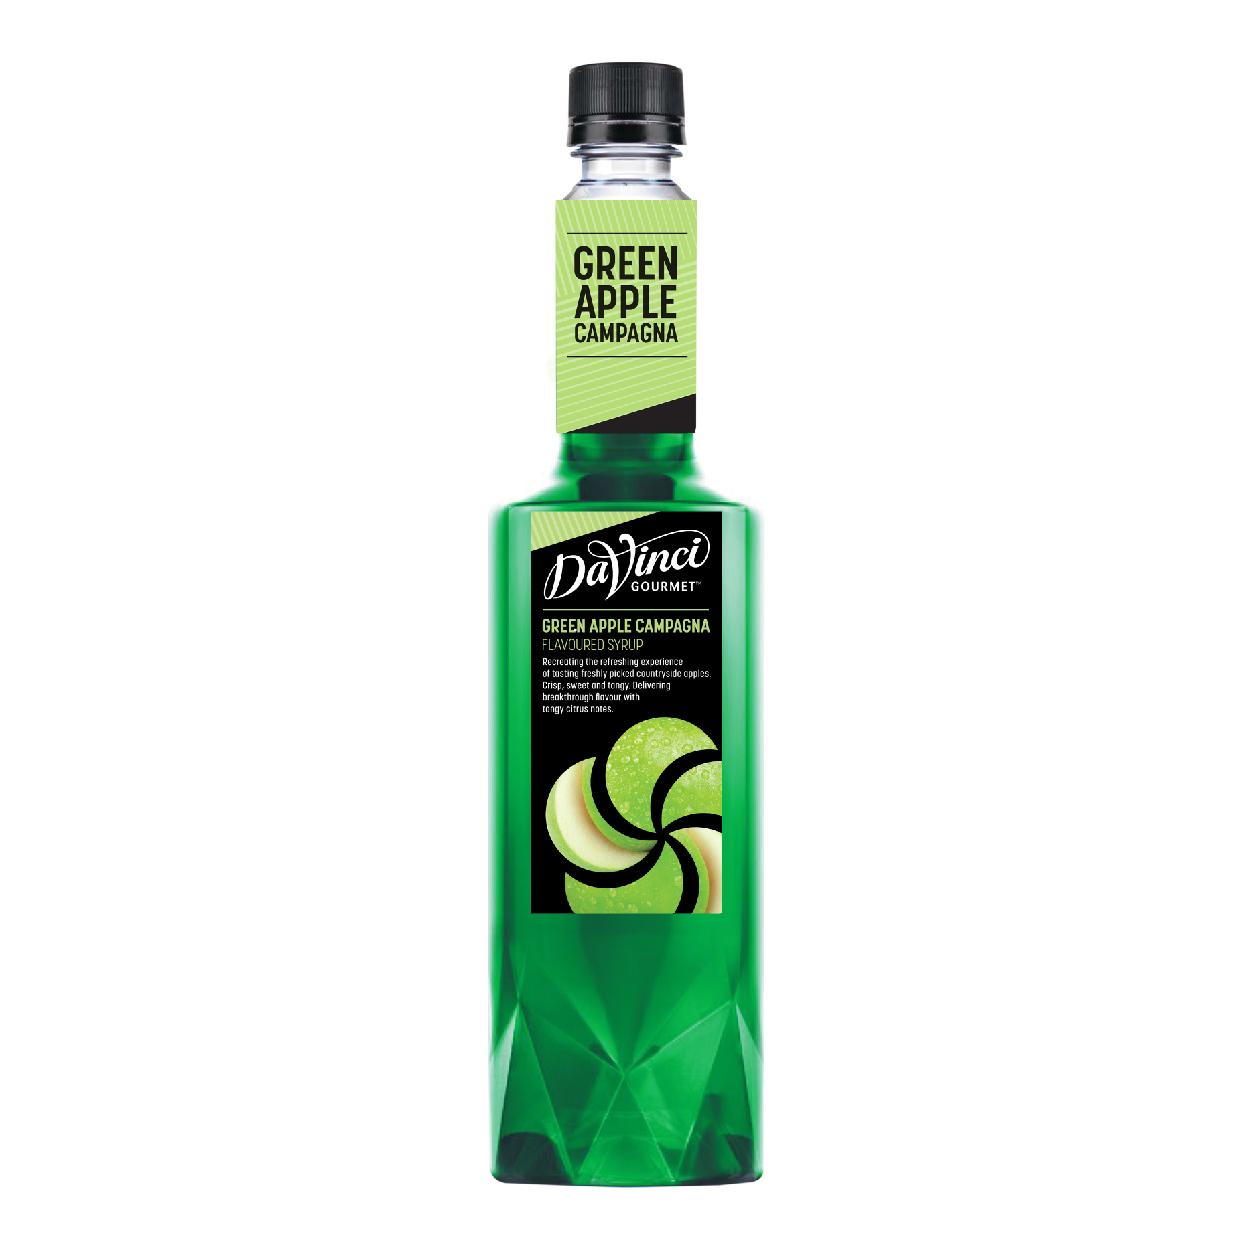 Siro Hương Táo Xanh / Green Apple Campagna Syrup - DaVinci Gourmet